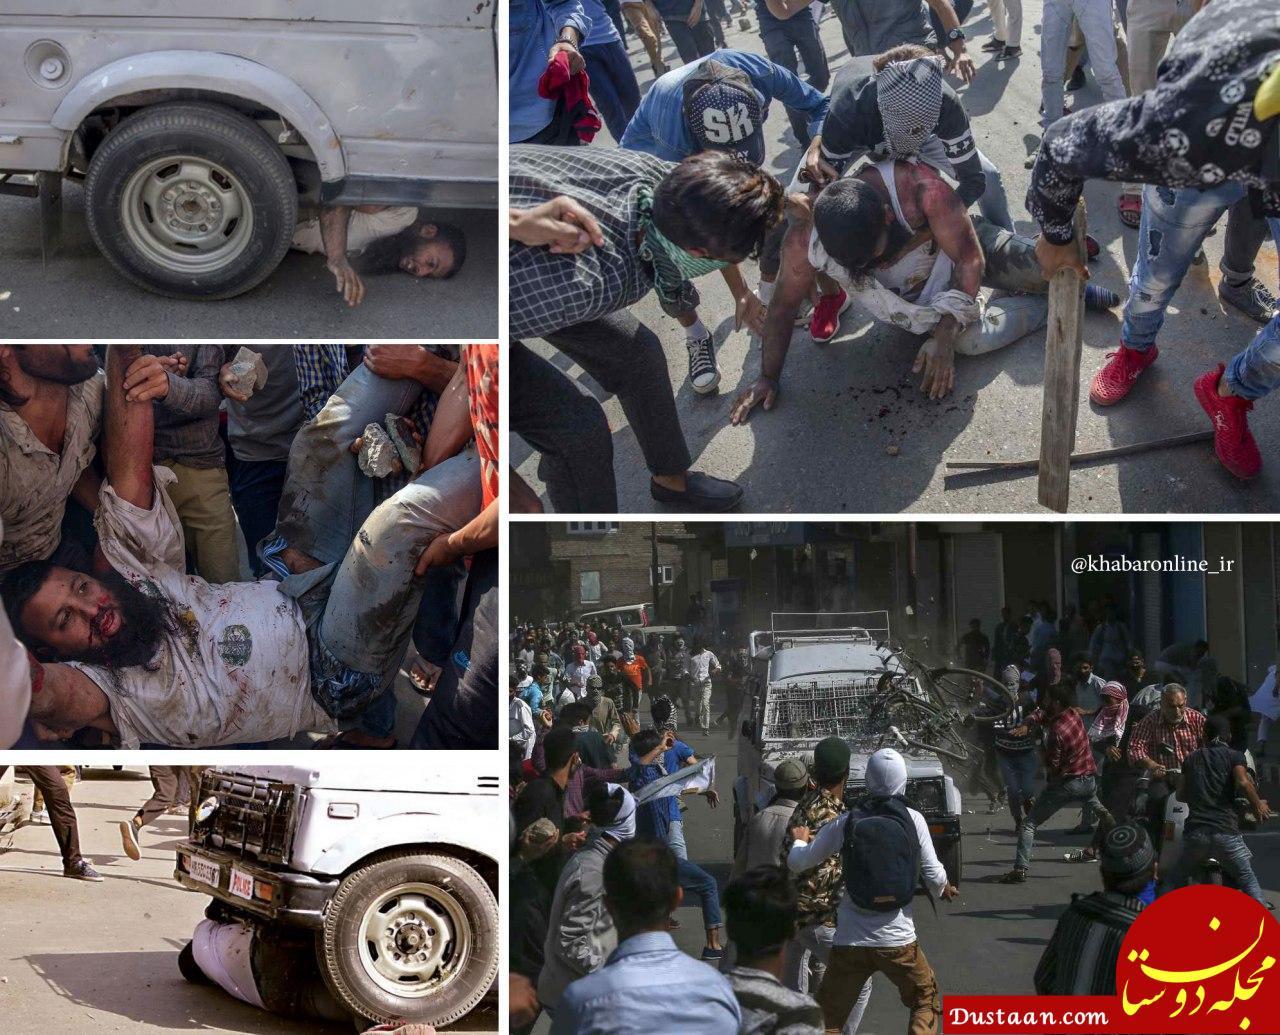 www.dustaan.com تصاویر تکان دهنده از زیرگرفتن تظاهرکنندگان توسط پلیس هند